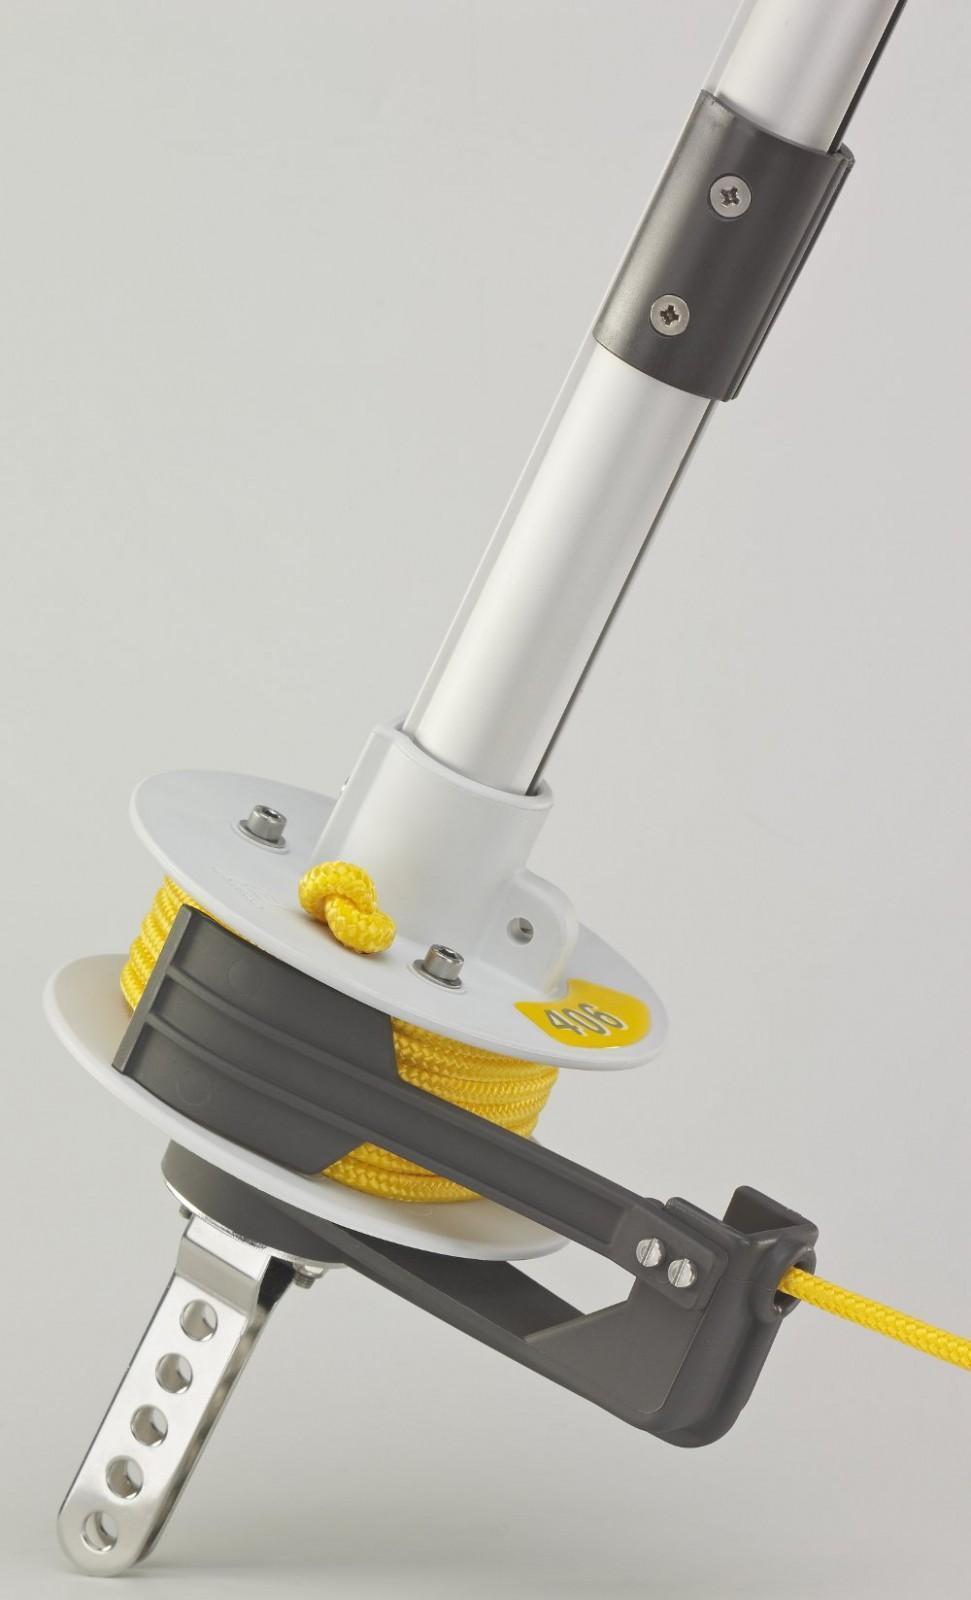 Plastimo 406S Reefing Furling System Chainplate Model